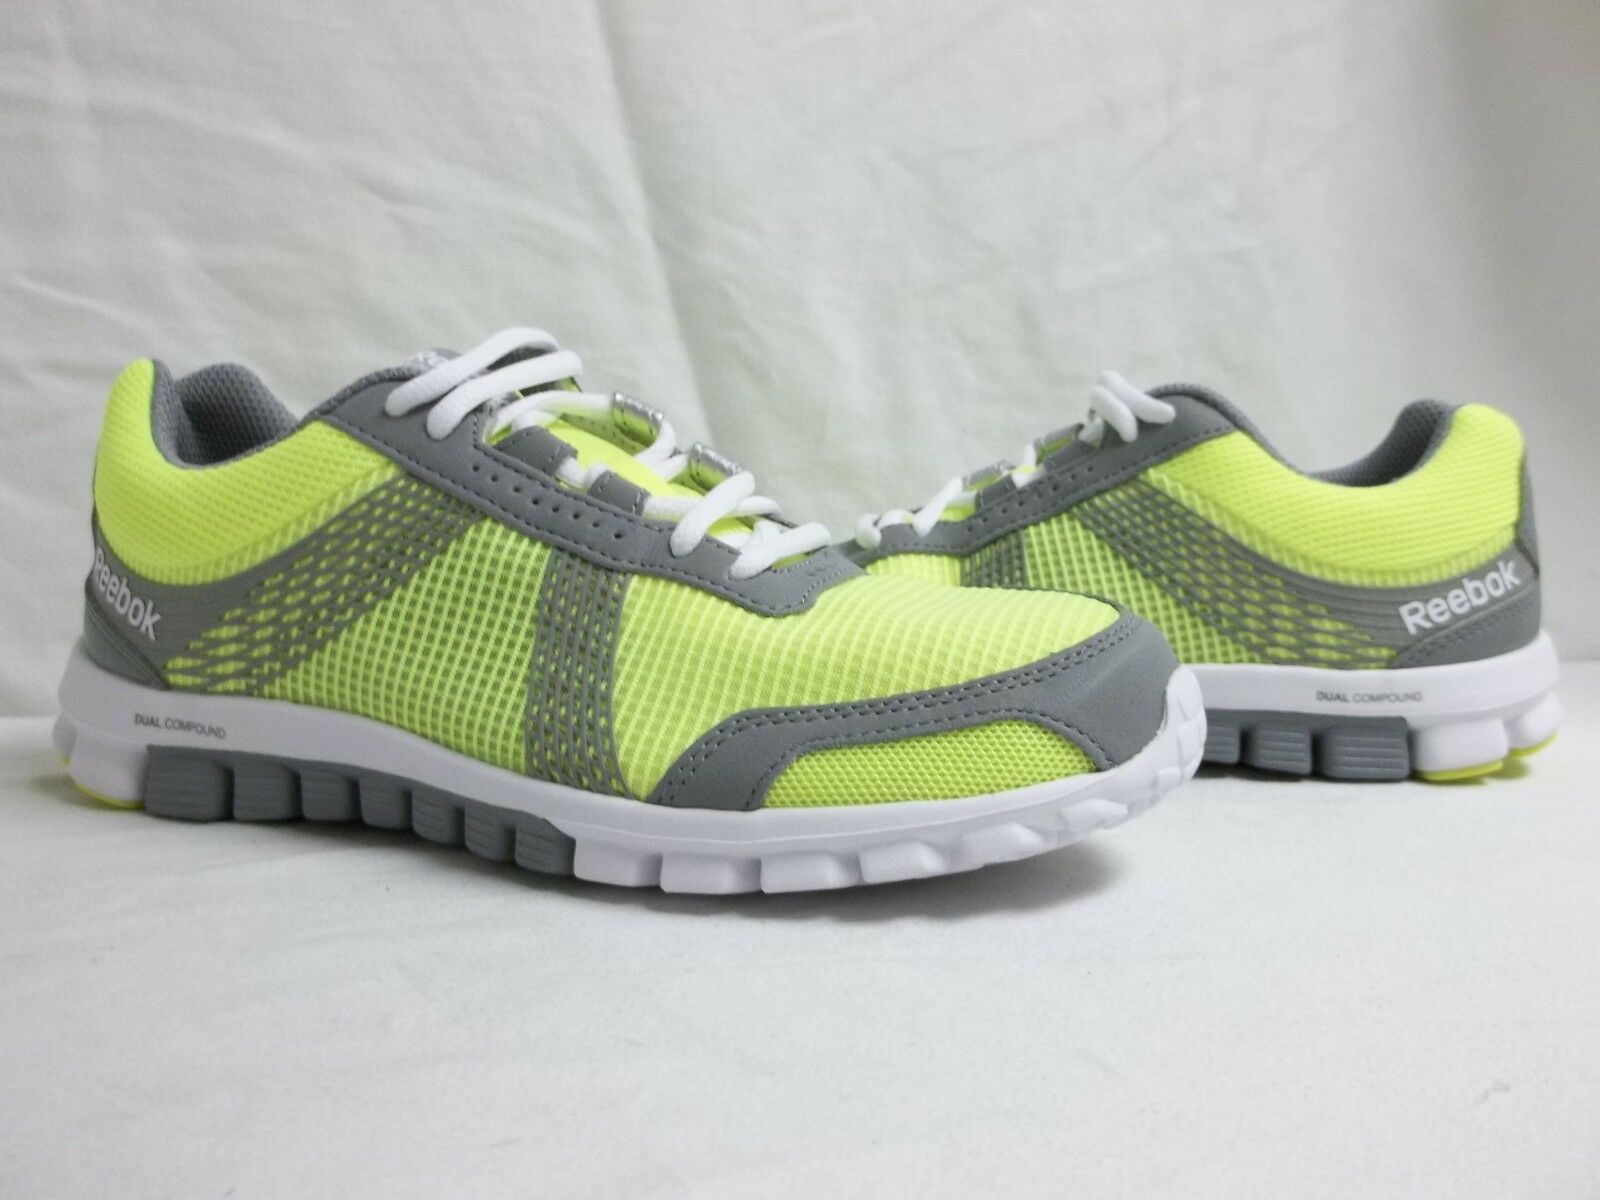 Reebok Sz 8 M RealFlex Tempo Run 2.0 Grau Running Sneakers New Damenschuhe Schuhes NWOB